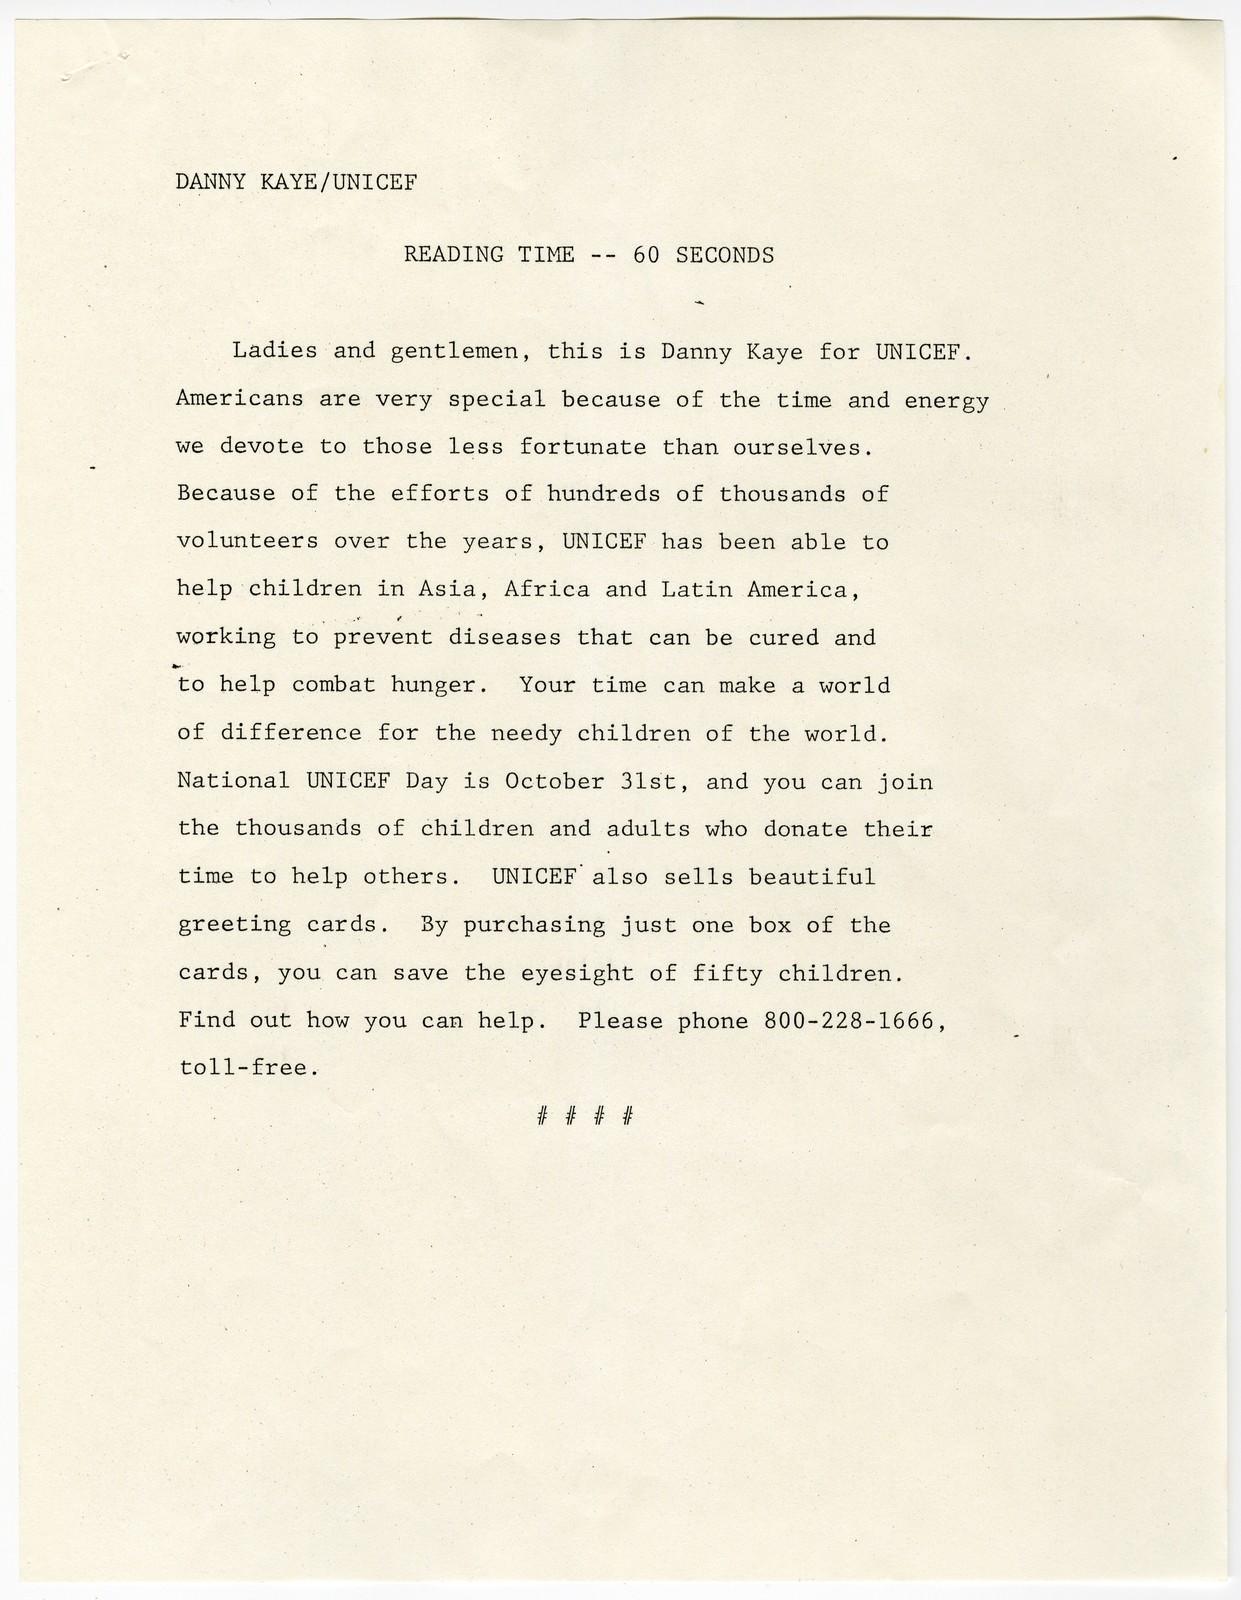 [ Danny Kaye/UNICEF - Reading Time - 60 seconds]